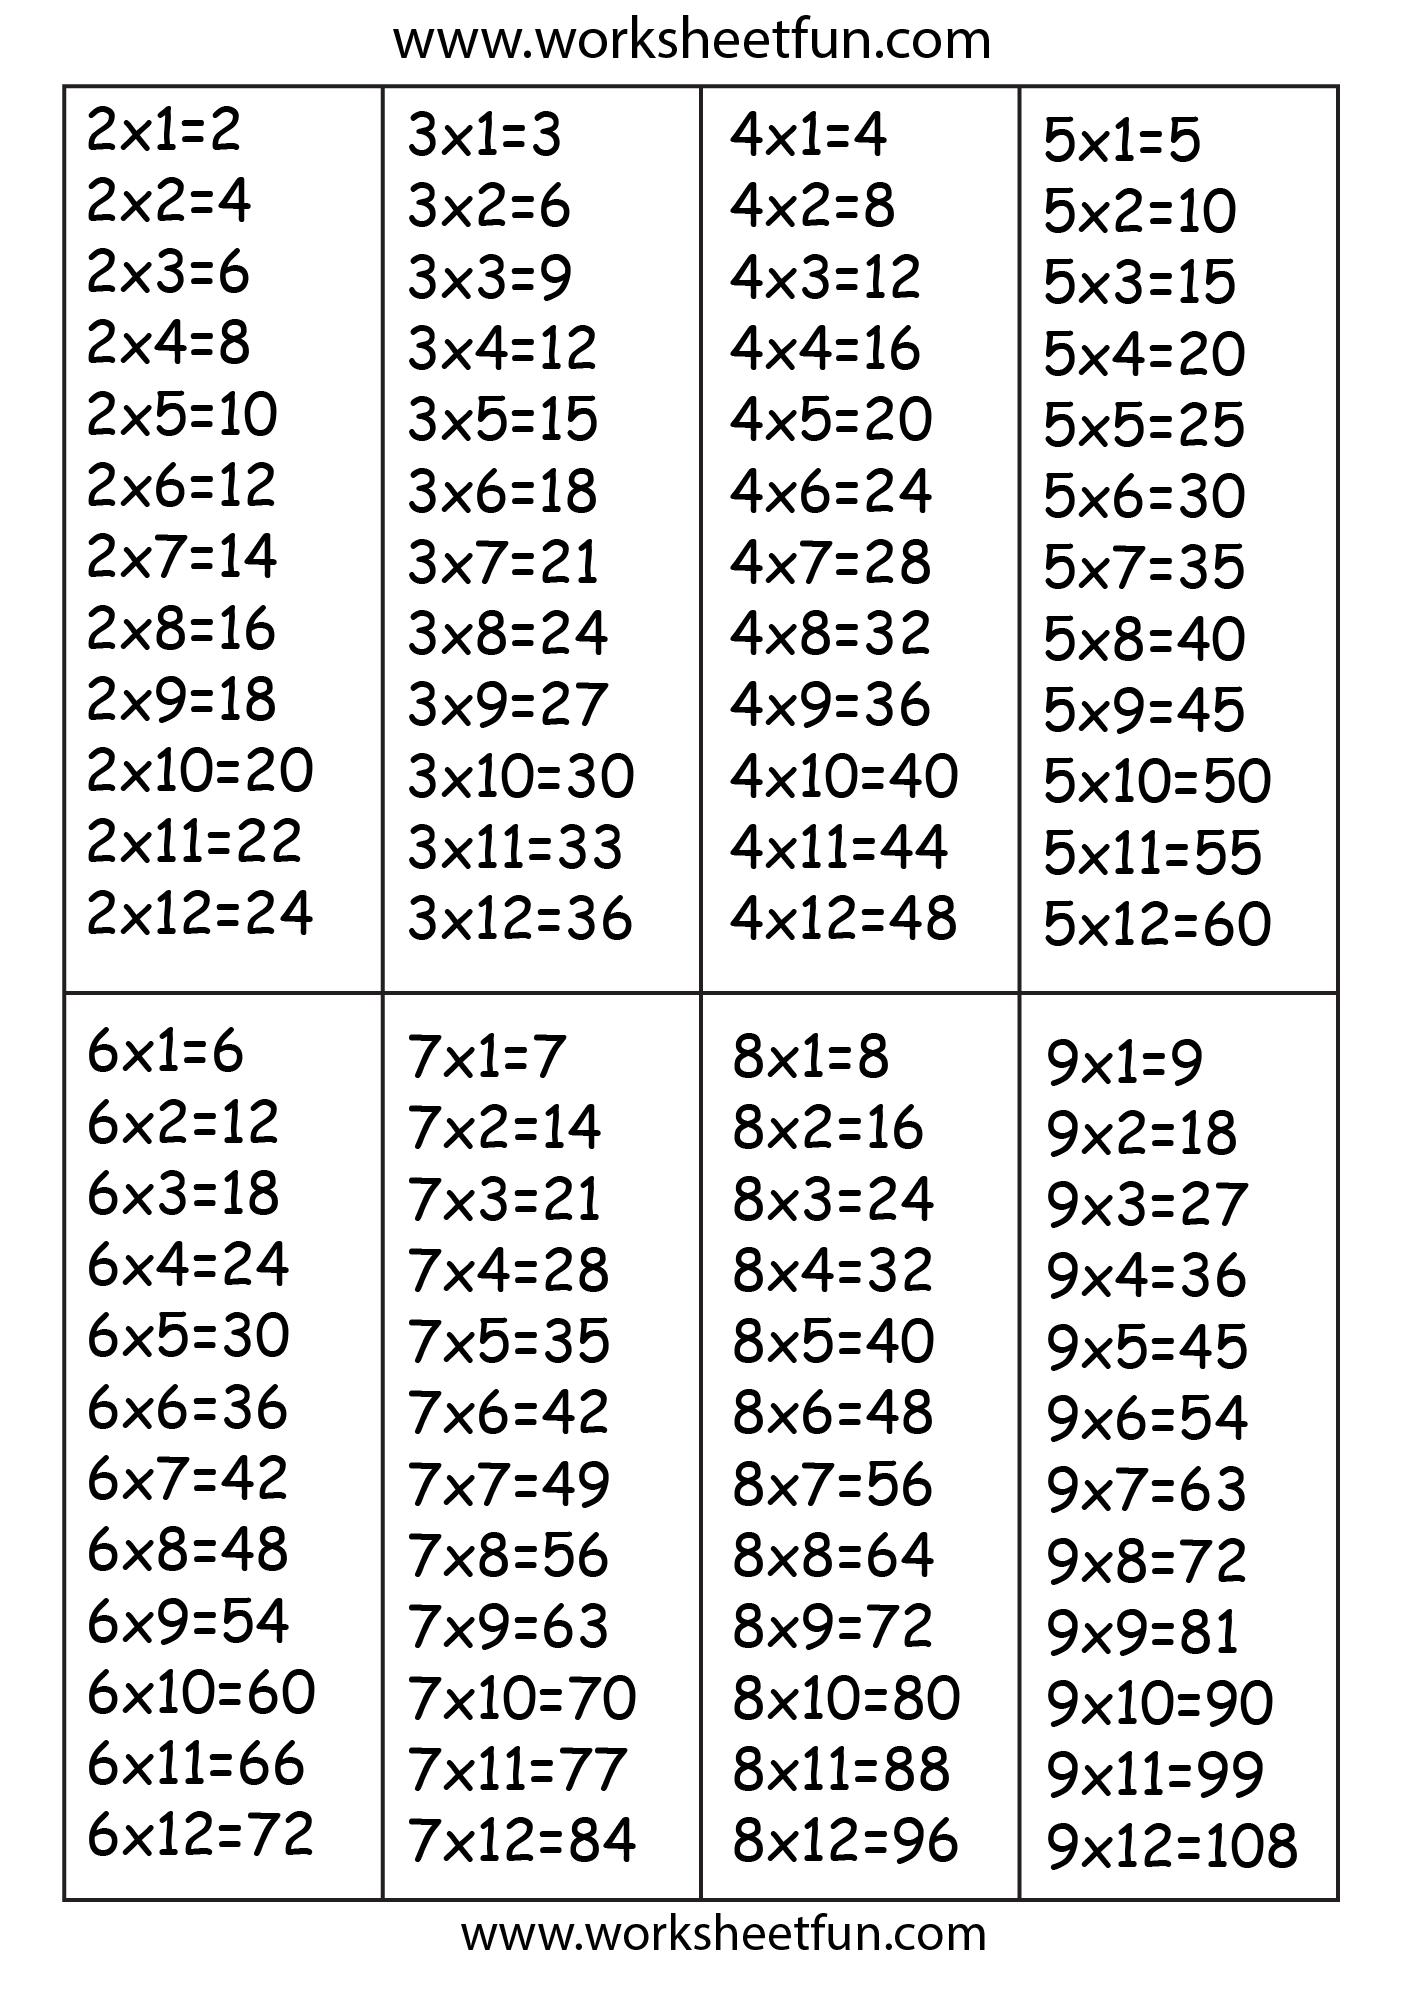 Opdreunen Maar Die Tafels Times Tables Worksheets Times Table Chart Multiplication Chart [ 1989 x 1405 Pixel ]